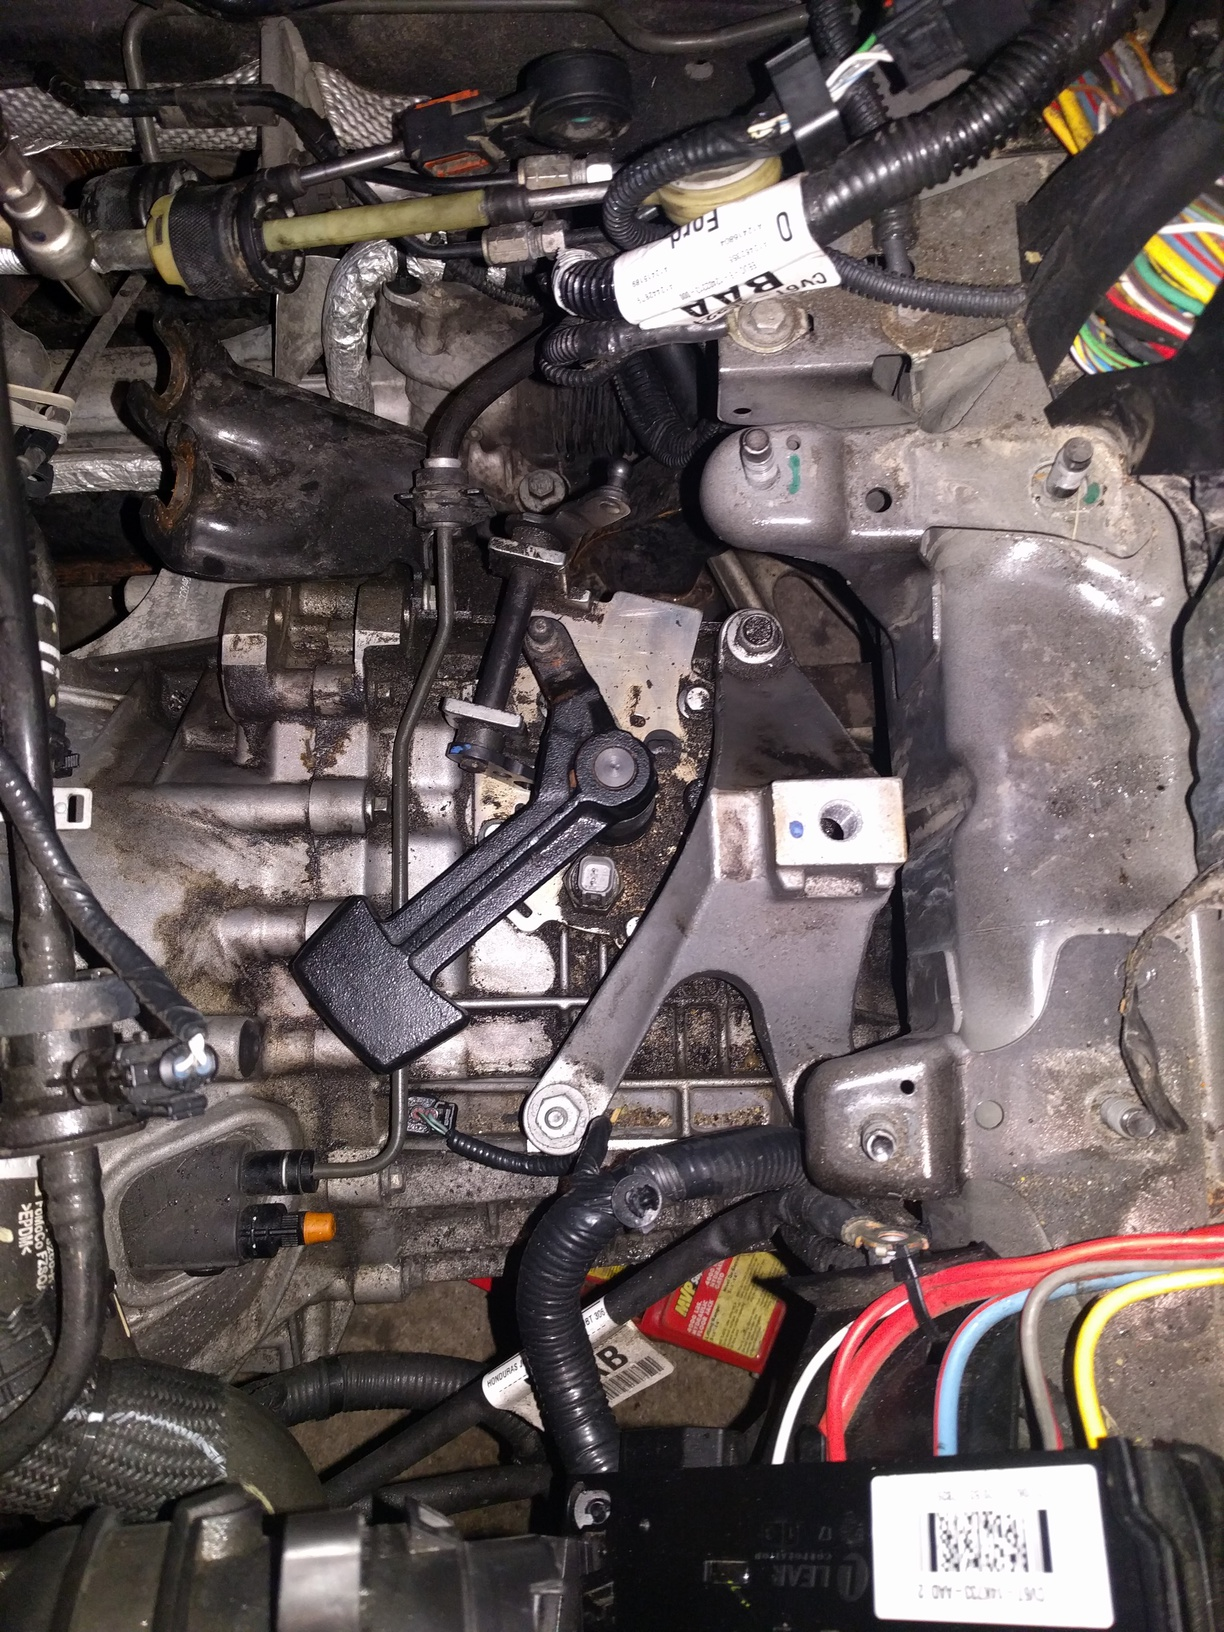 2017 Ford Focus 5mt Transmission Problems Img 20171213 121209 Jpg